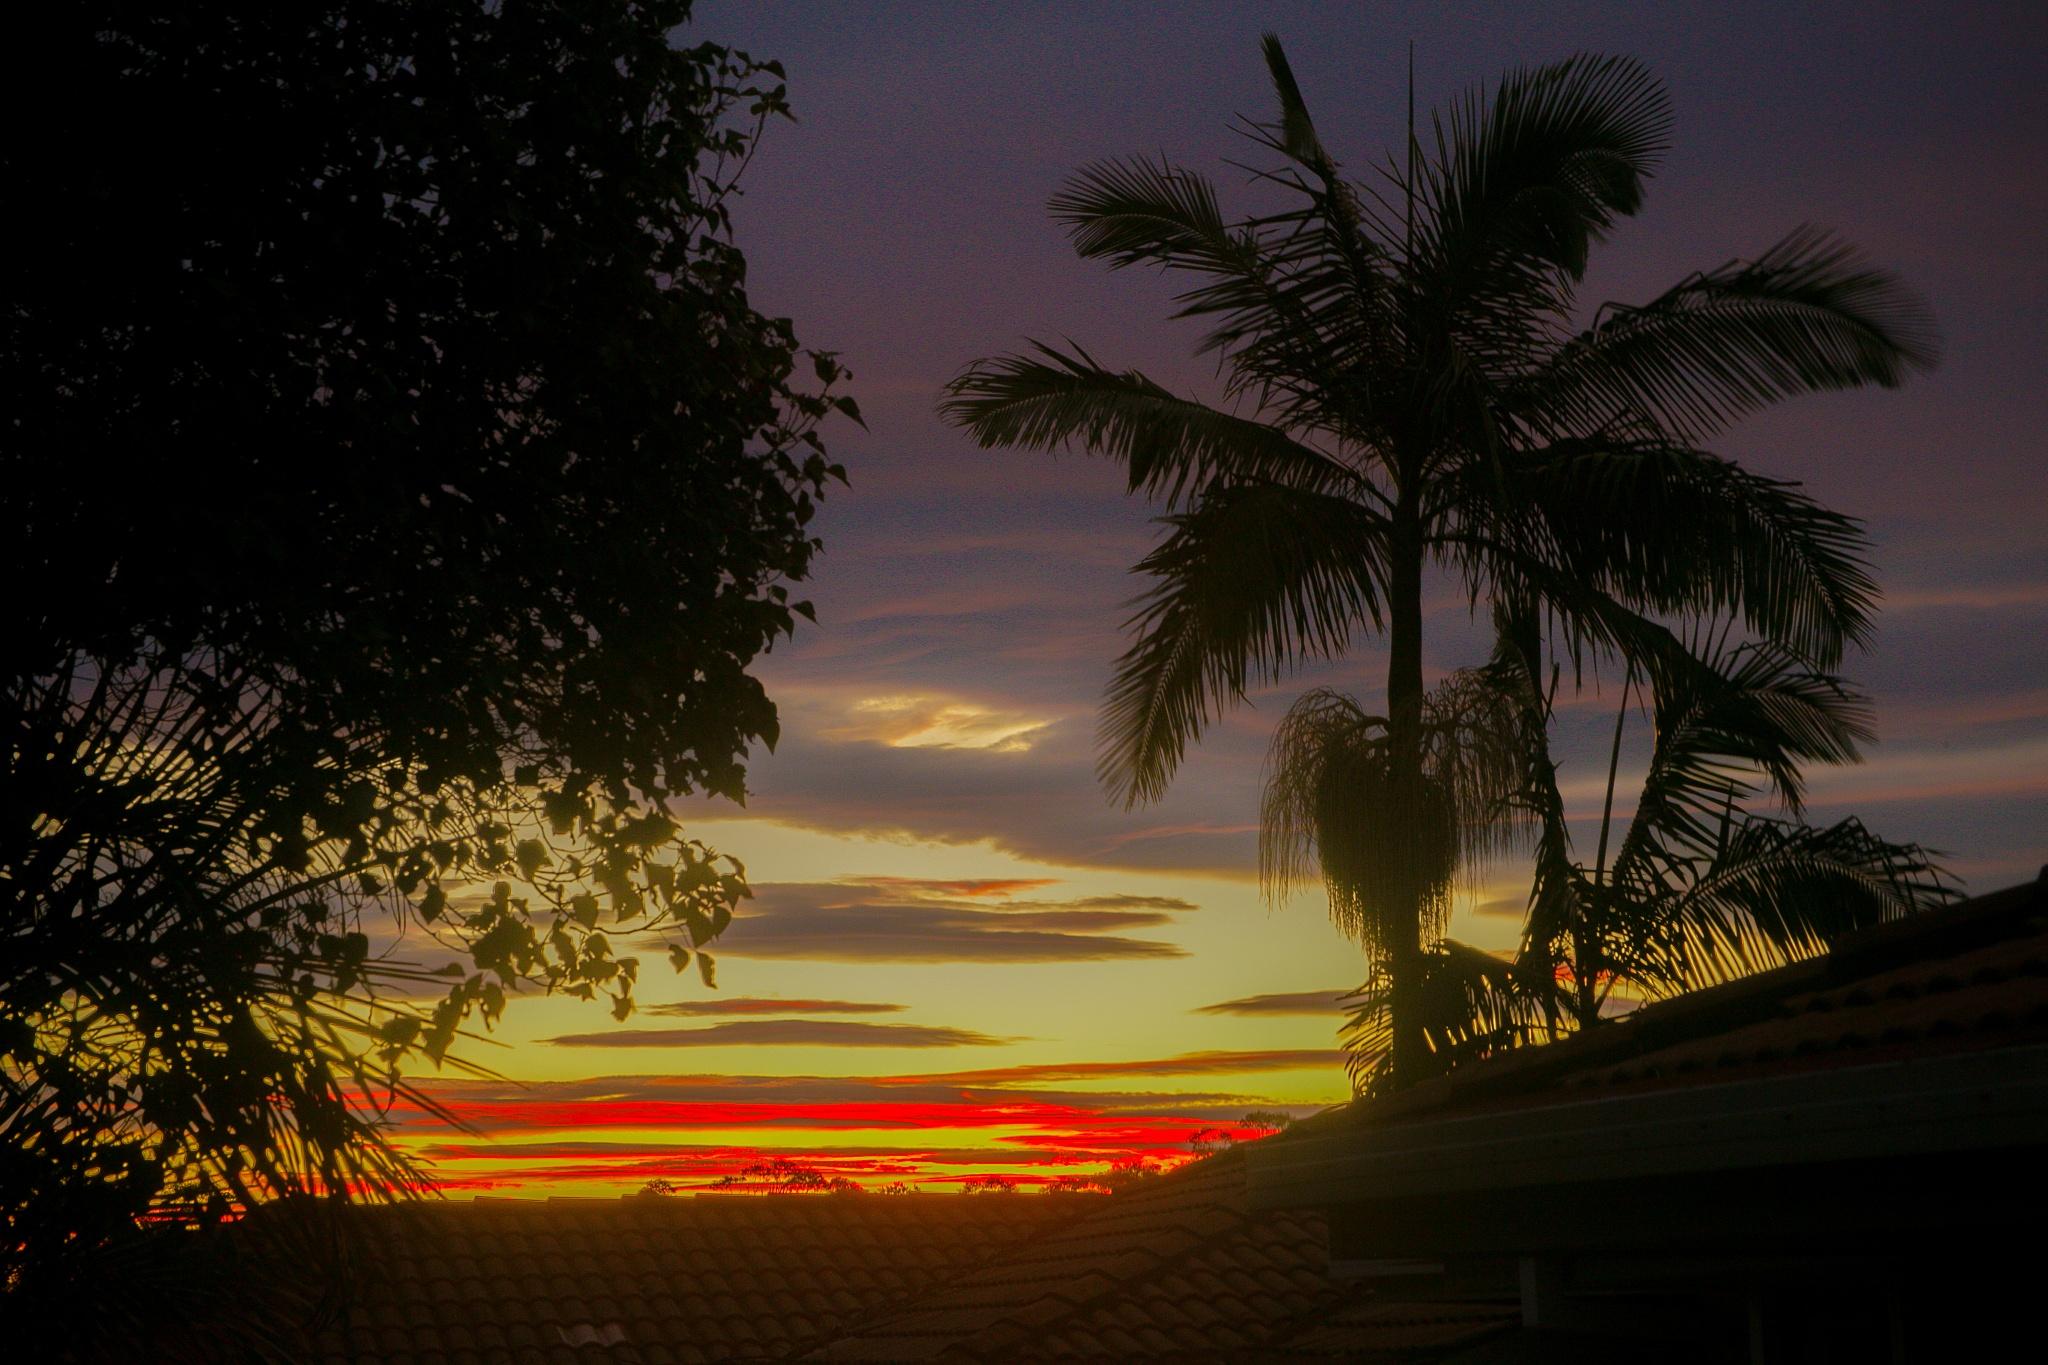 Sunset  by Daz Laughton